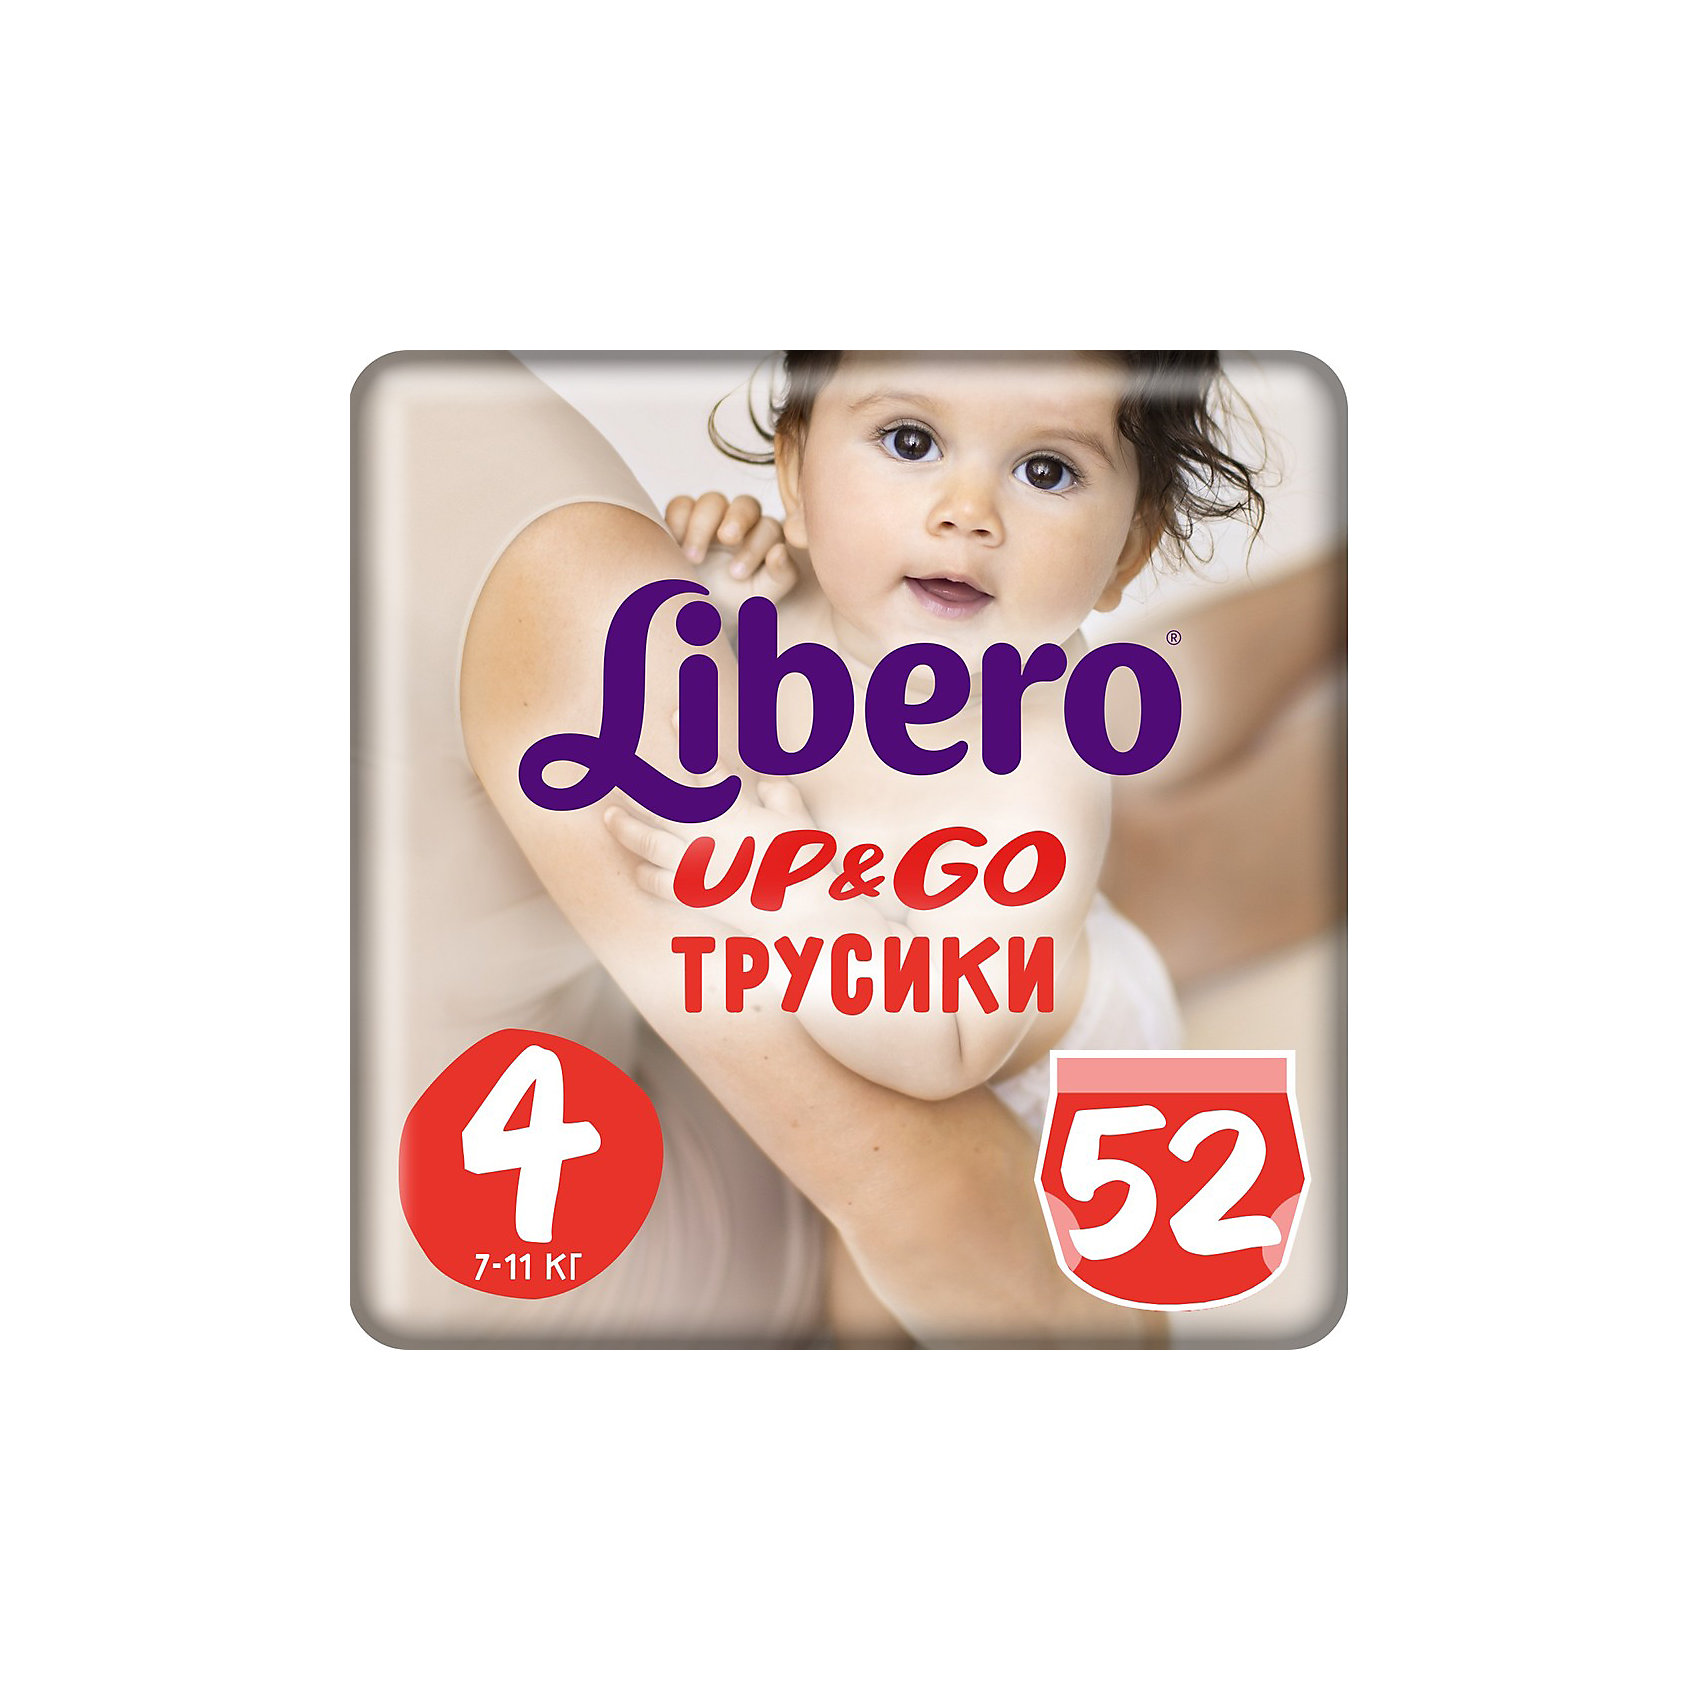 Libero Трусики Up&Go, Mega Maxi 7-11 кг (4), 52 шт., Libero libero подгузники трусики up